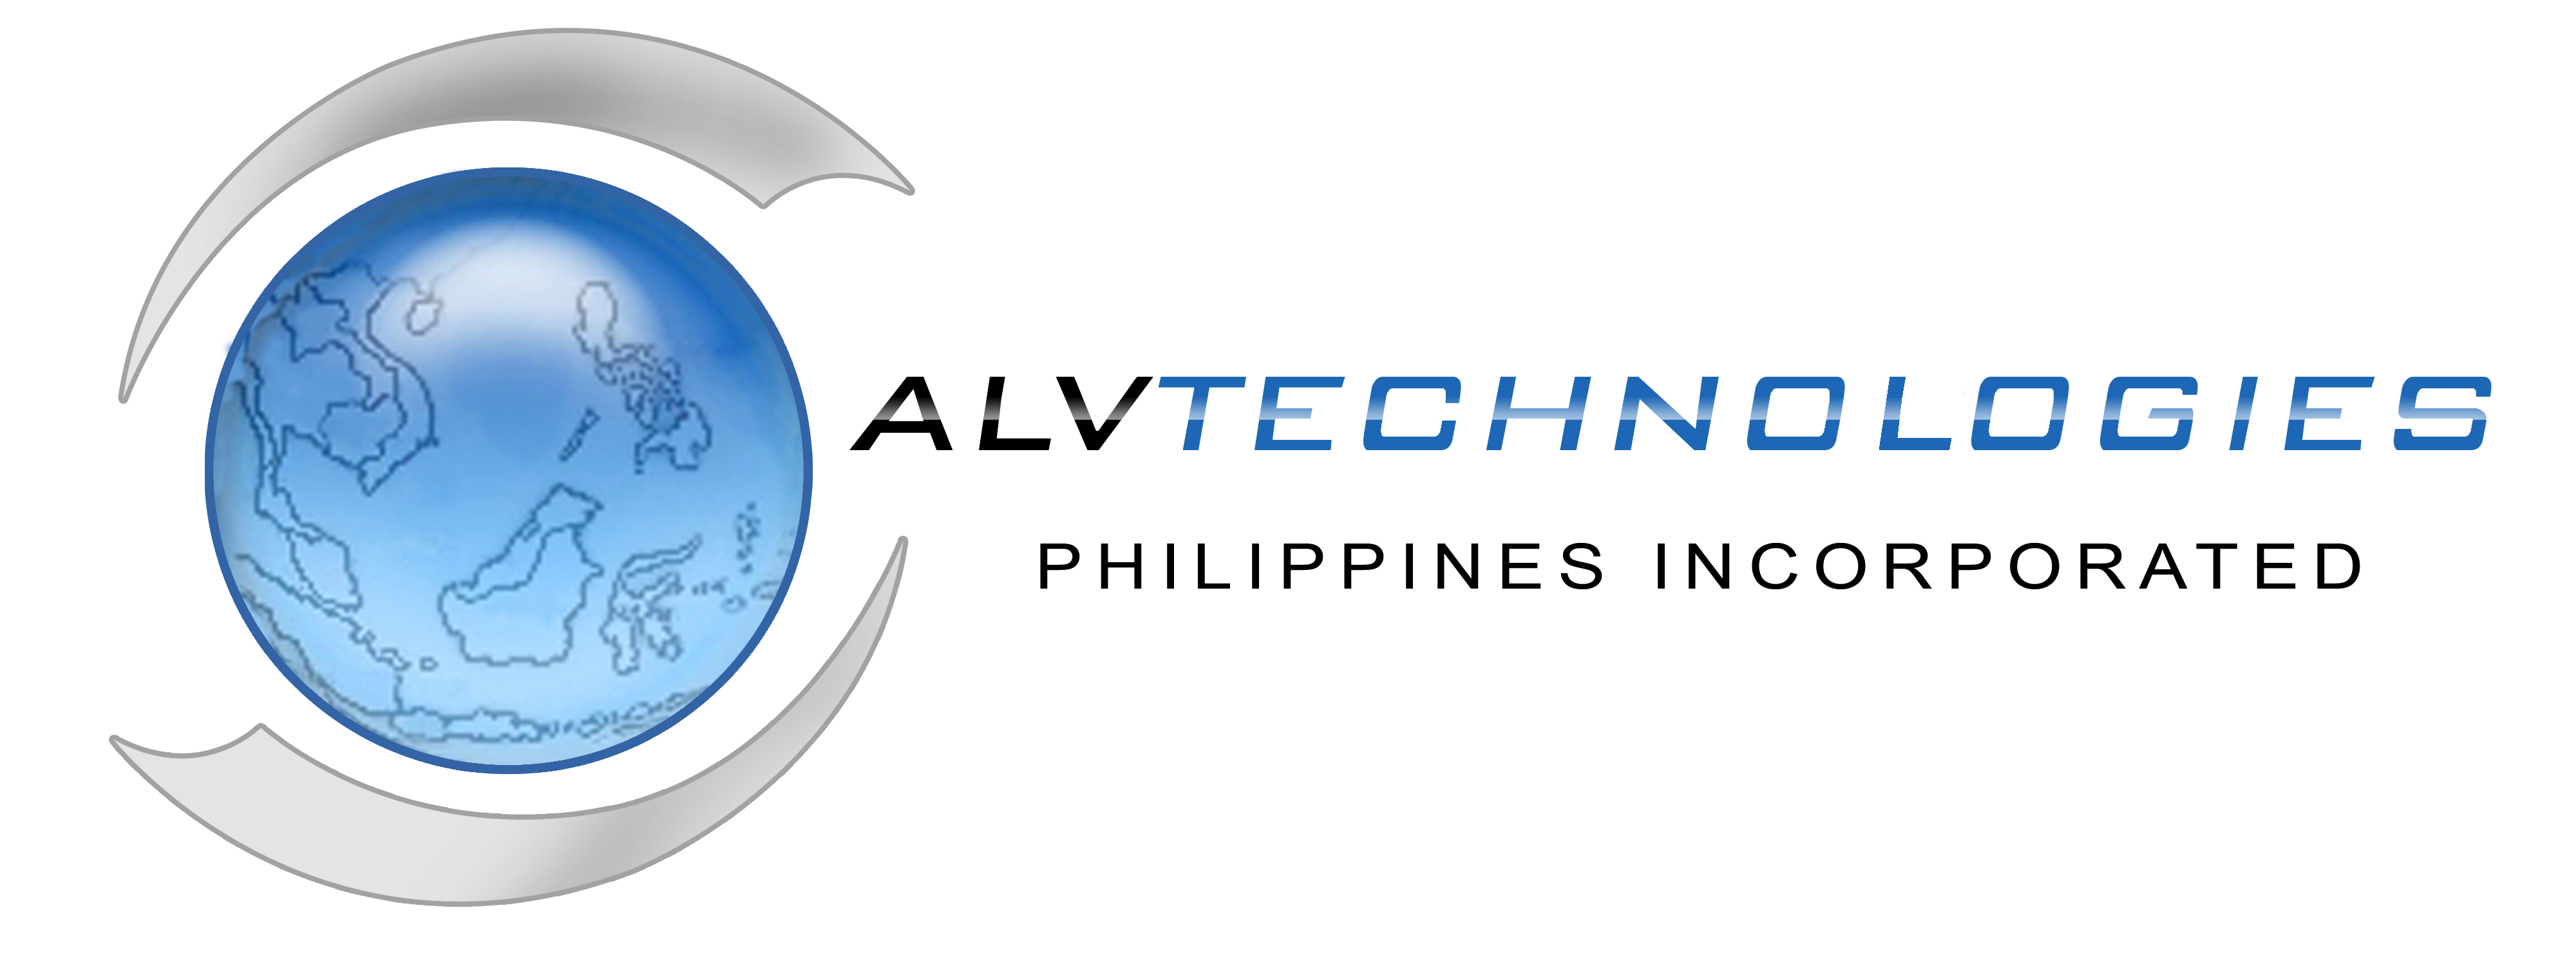 ALV Technologies